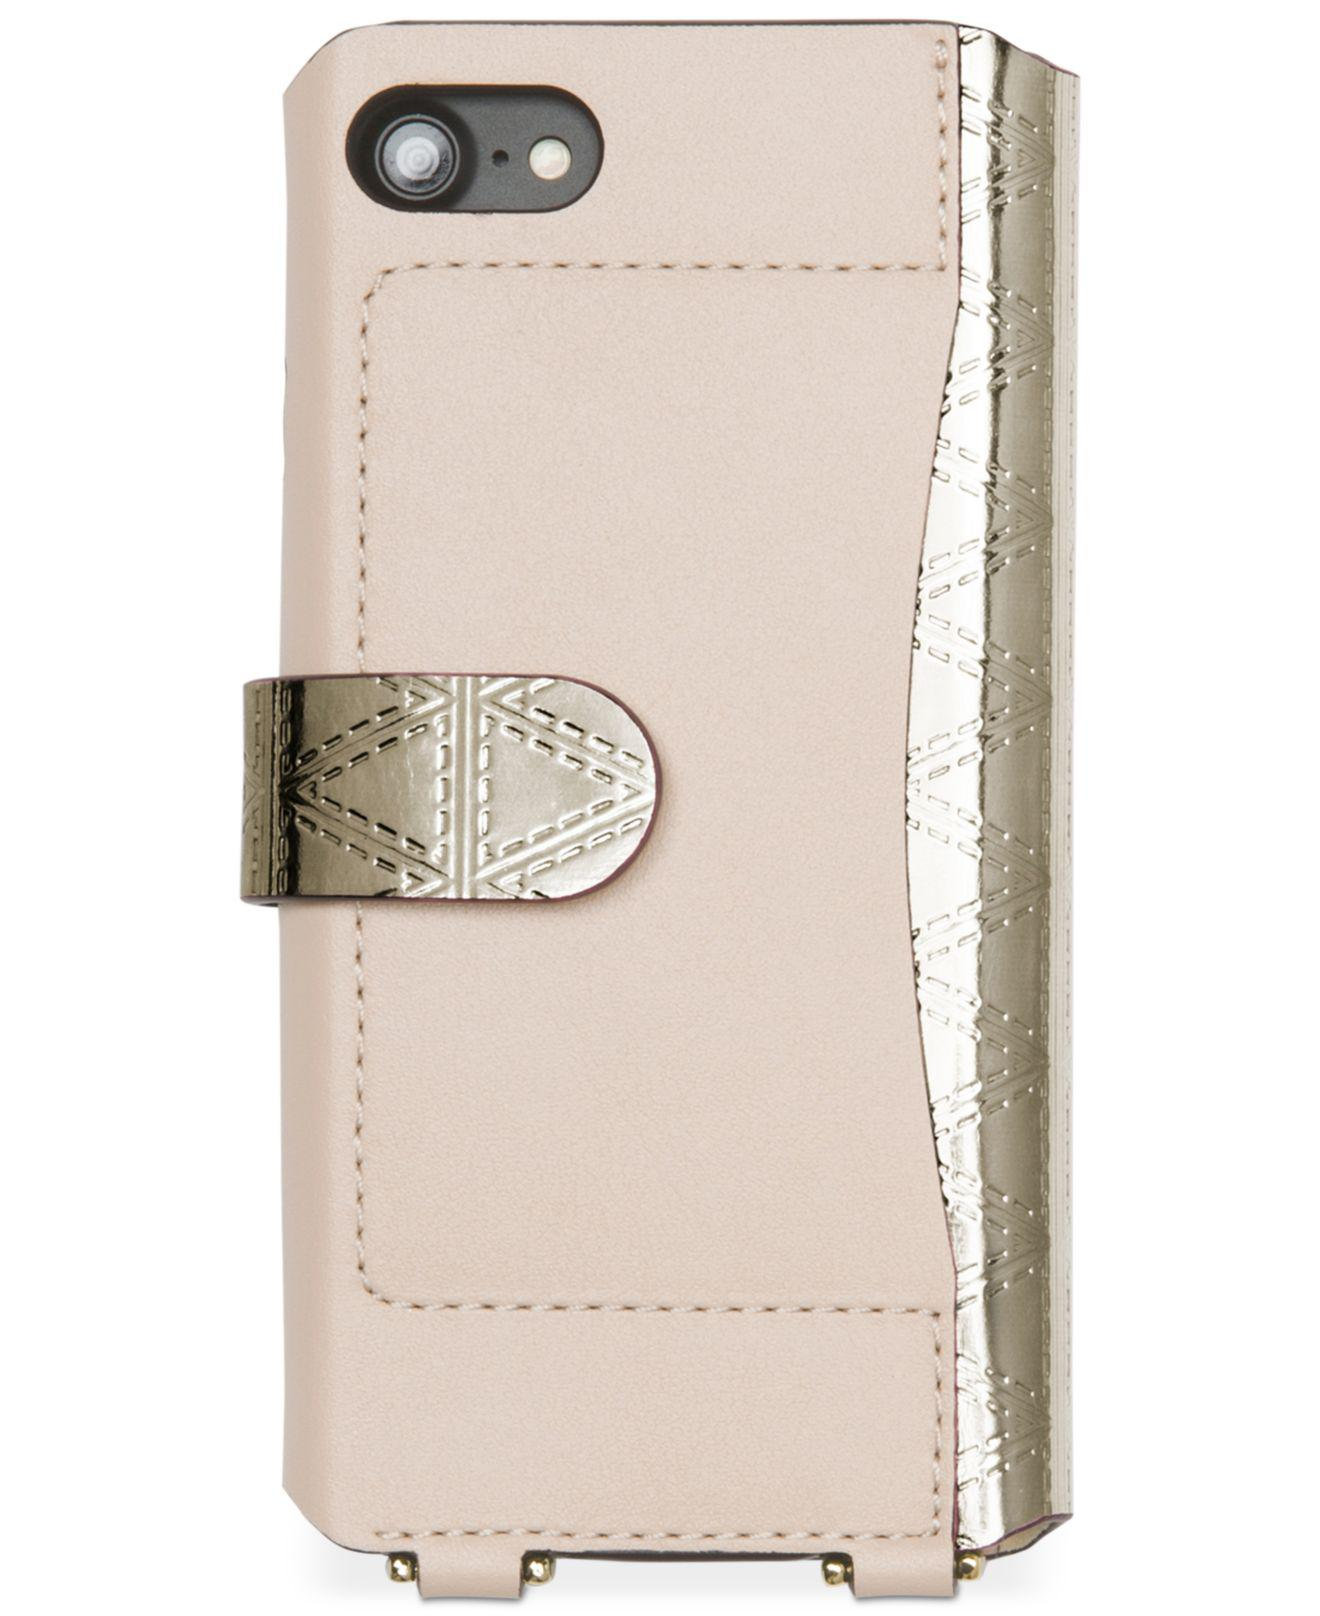 6c31c777b3e9 Michael Kors Iphone 7 Folio Case Crossbody - Lyst